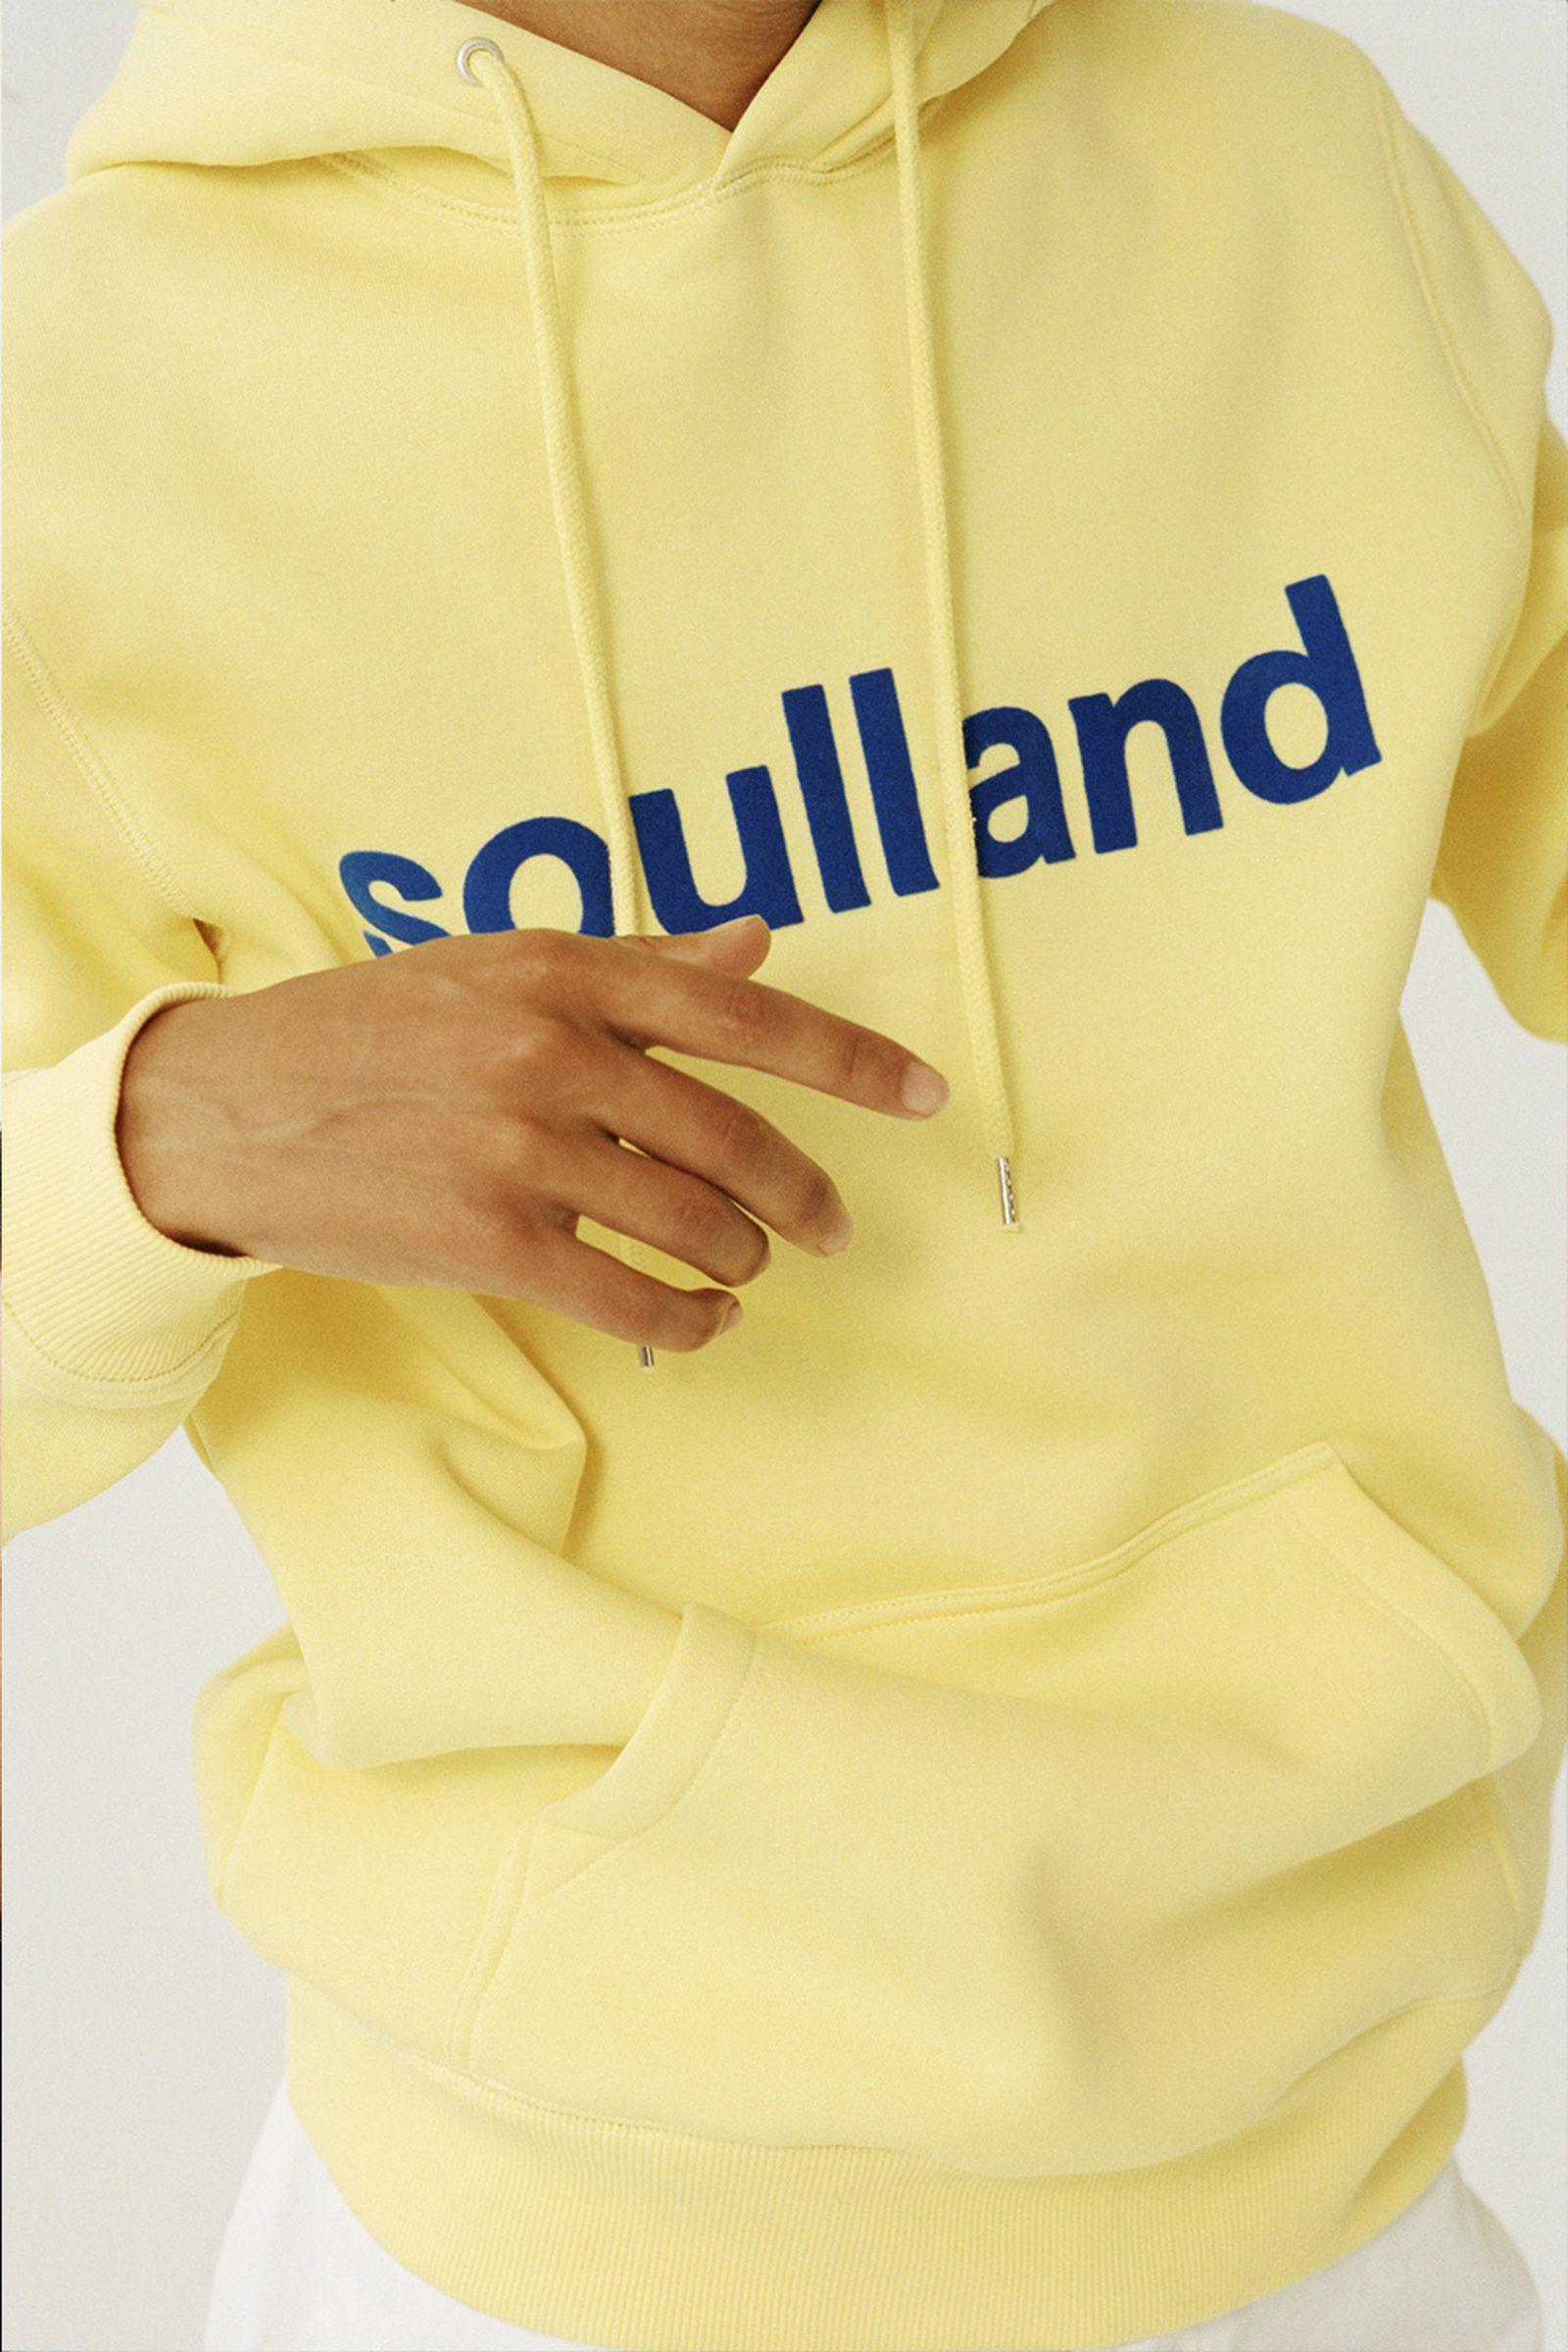 soulland logic